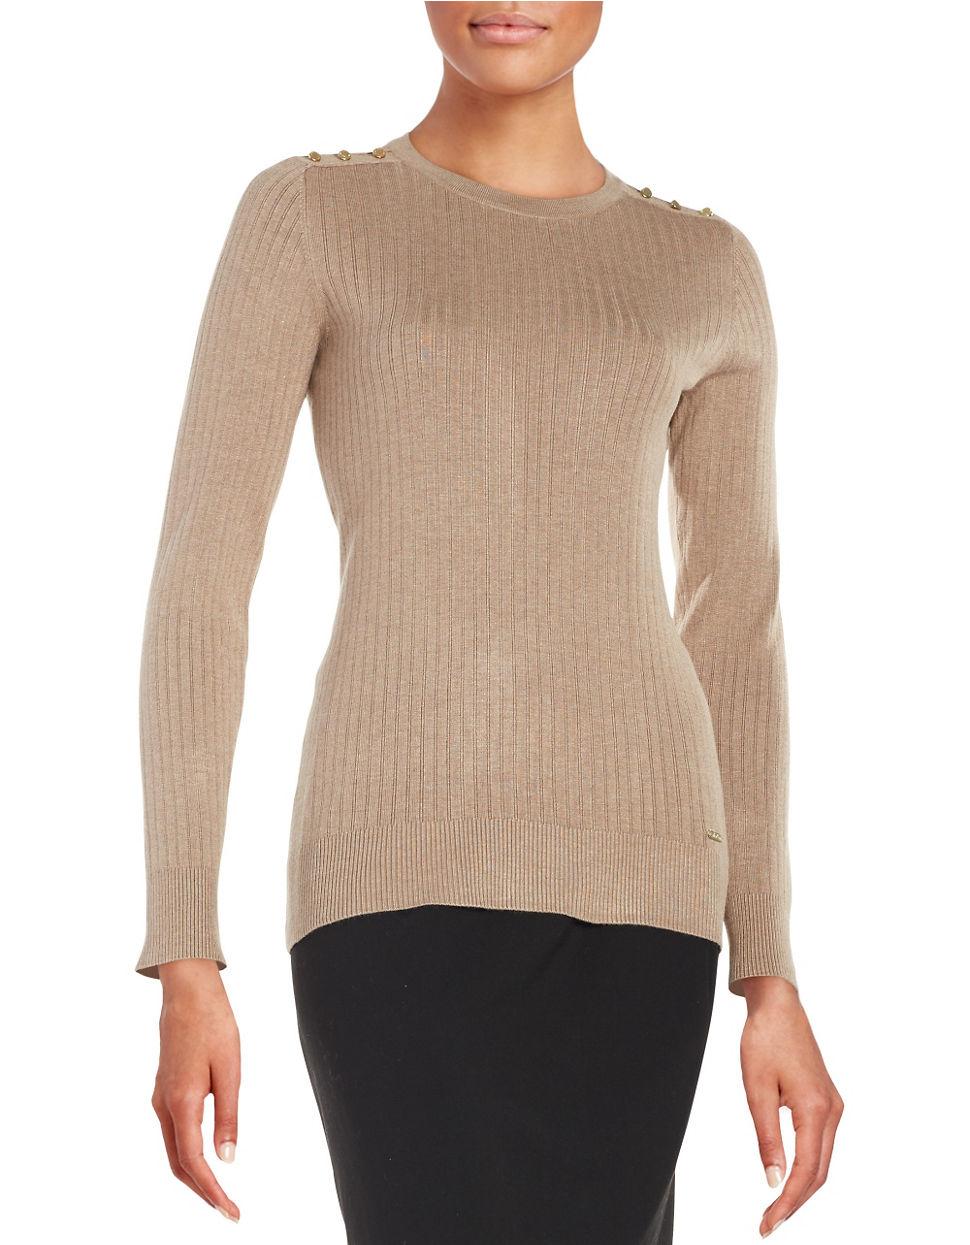 calvin klein ribbed knit sweater in beige heather frappe. Black Bedroom Furniture Sets. Home Design Ideas